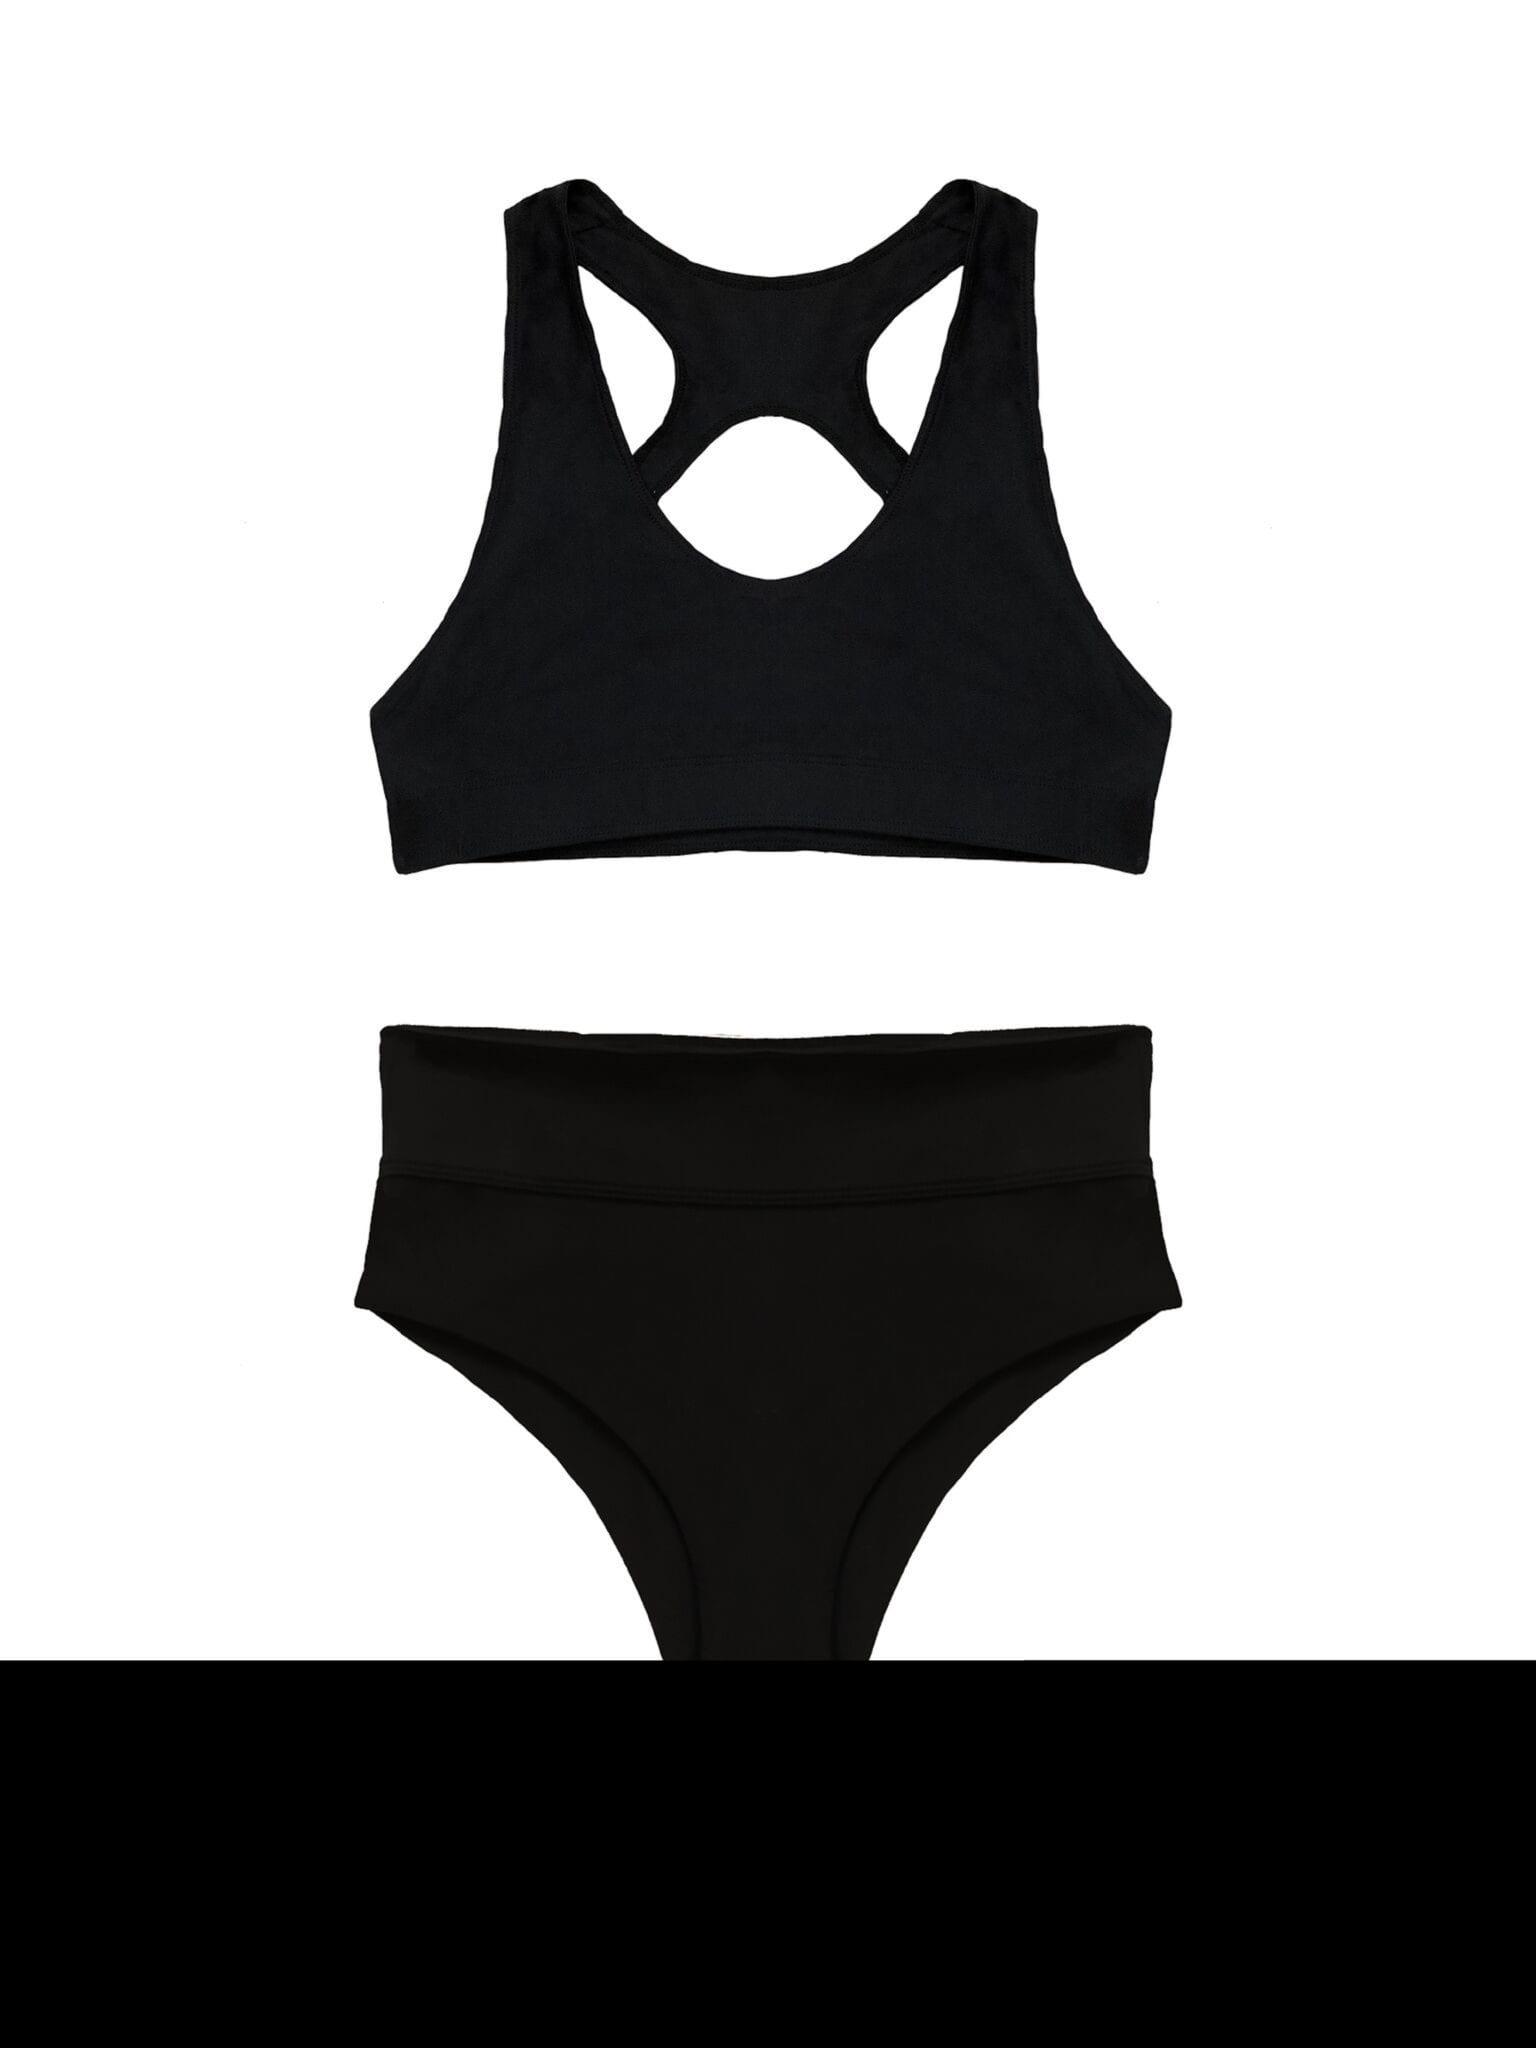 Worthmont swimsuit